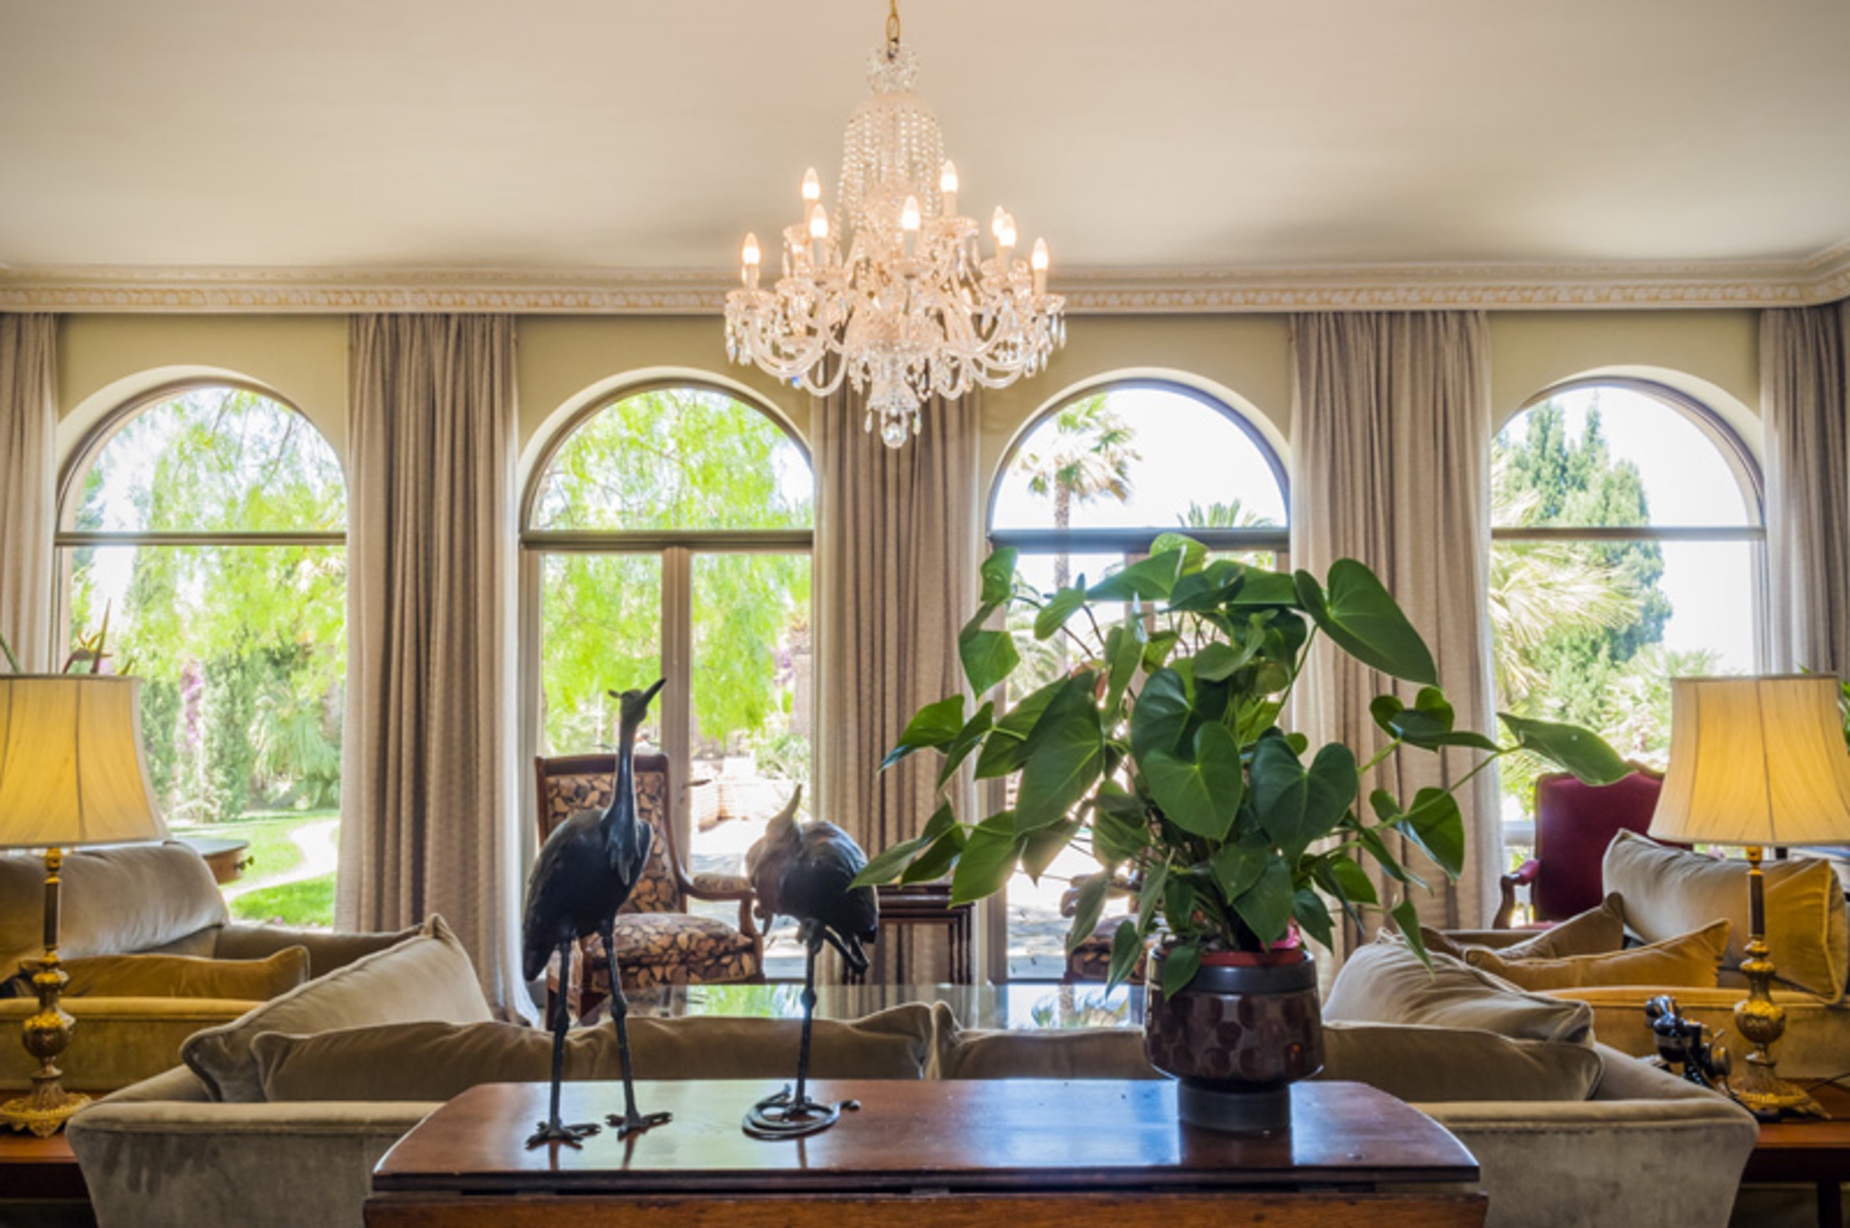 5 bed Villa For Rent in Iklin, Iklin - thumb 13